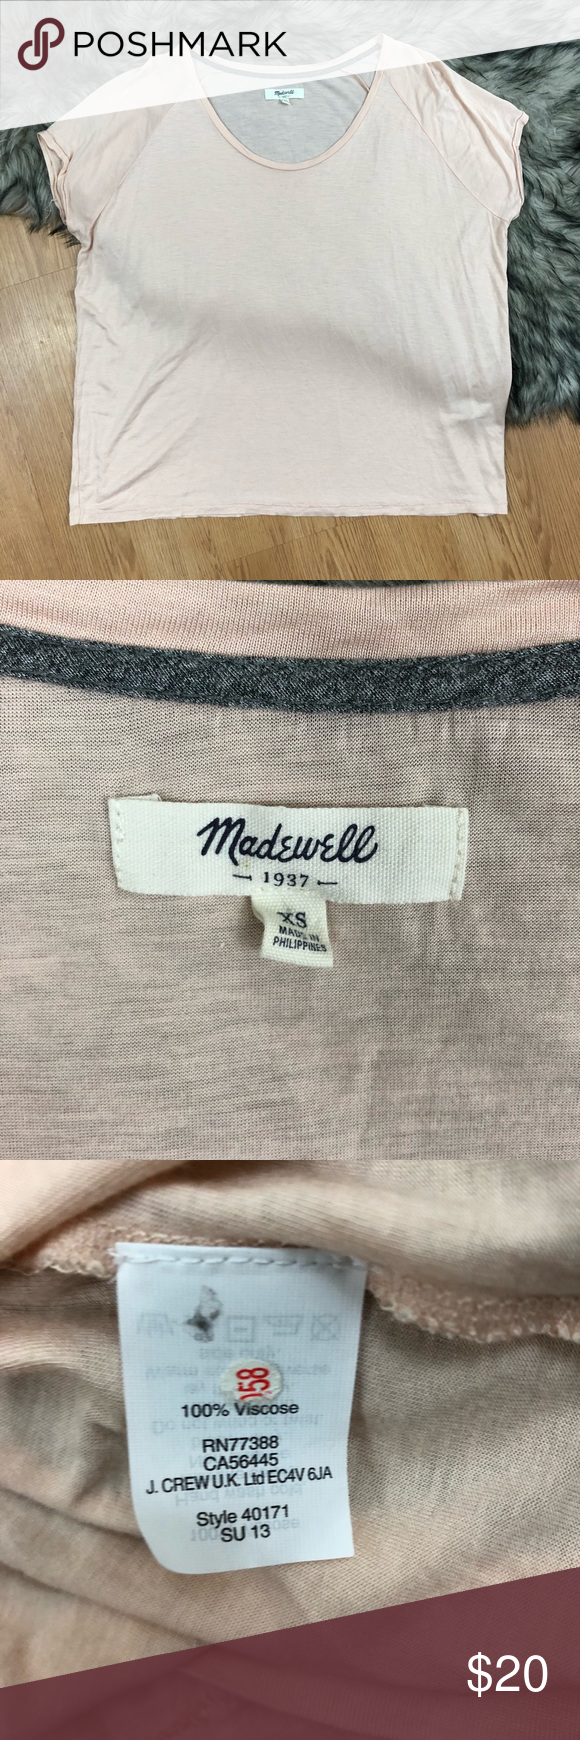 Madewell tee Pink tee size XS. Super soft!#34 Madewell Tops Tees - Short Sleeve